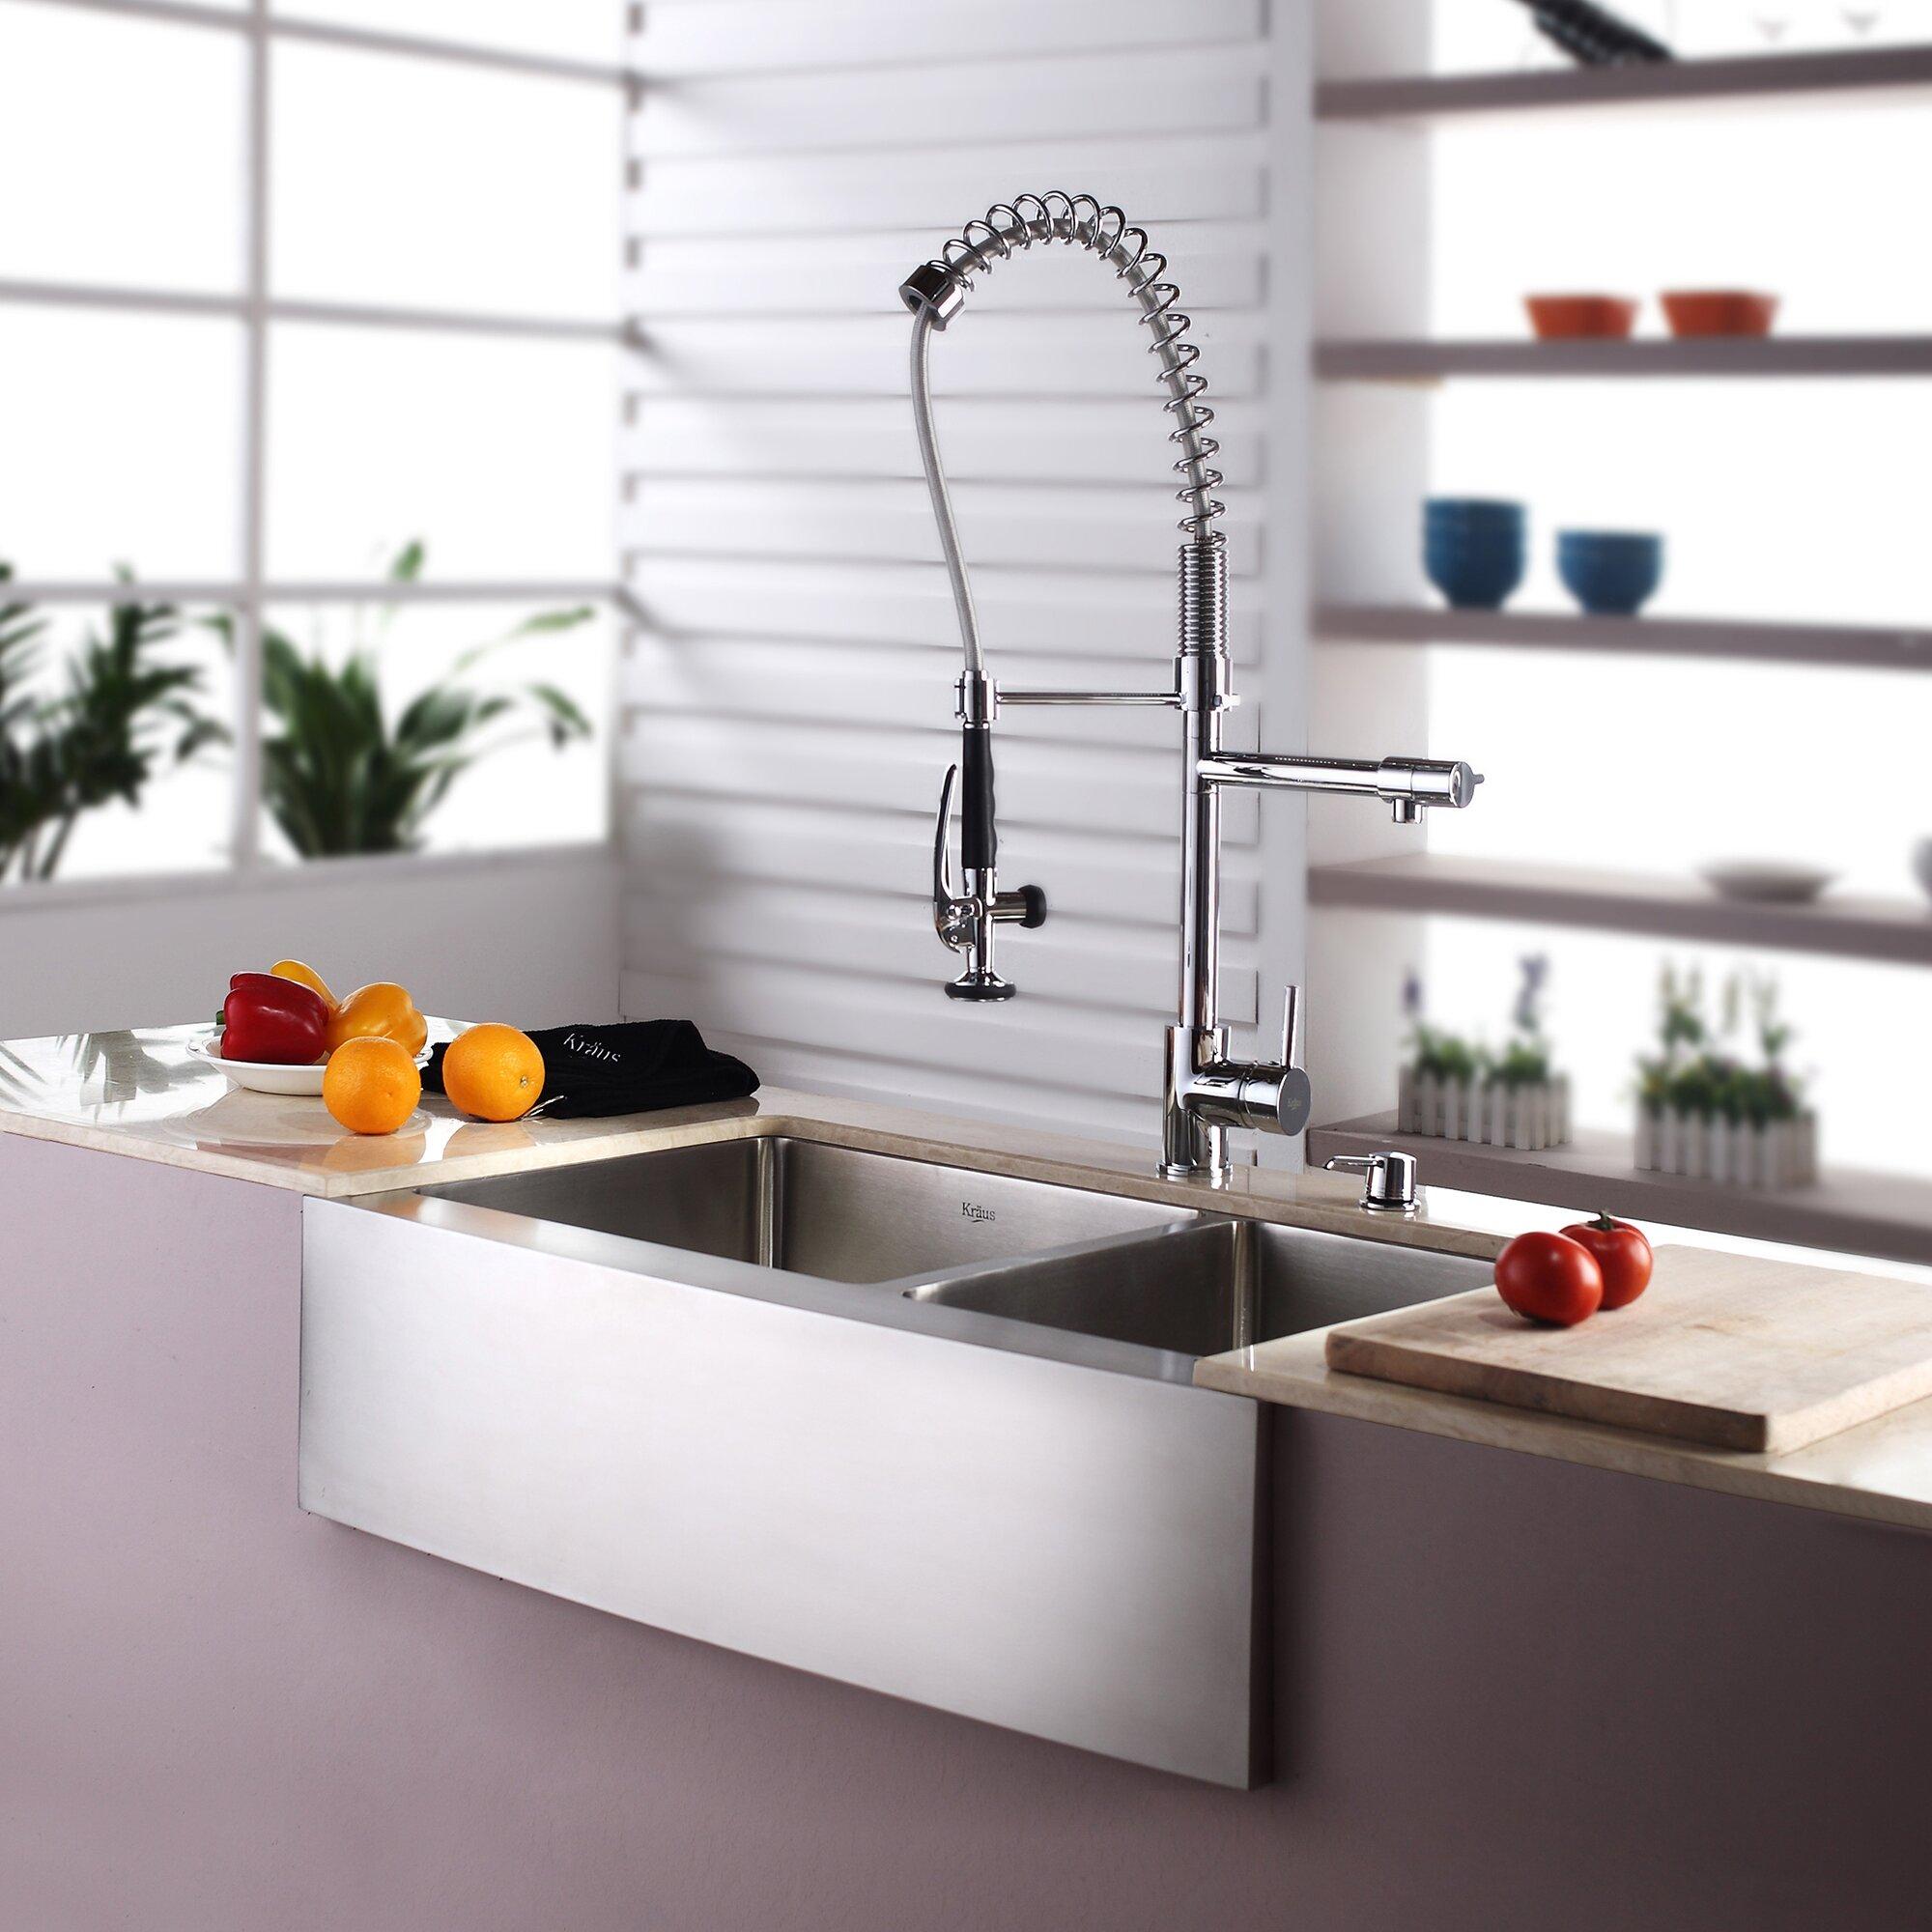 Kraus Kitchen Sink Reviews : Kraus Farmhouse 33